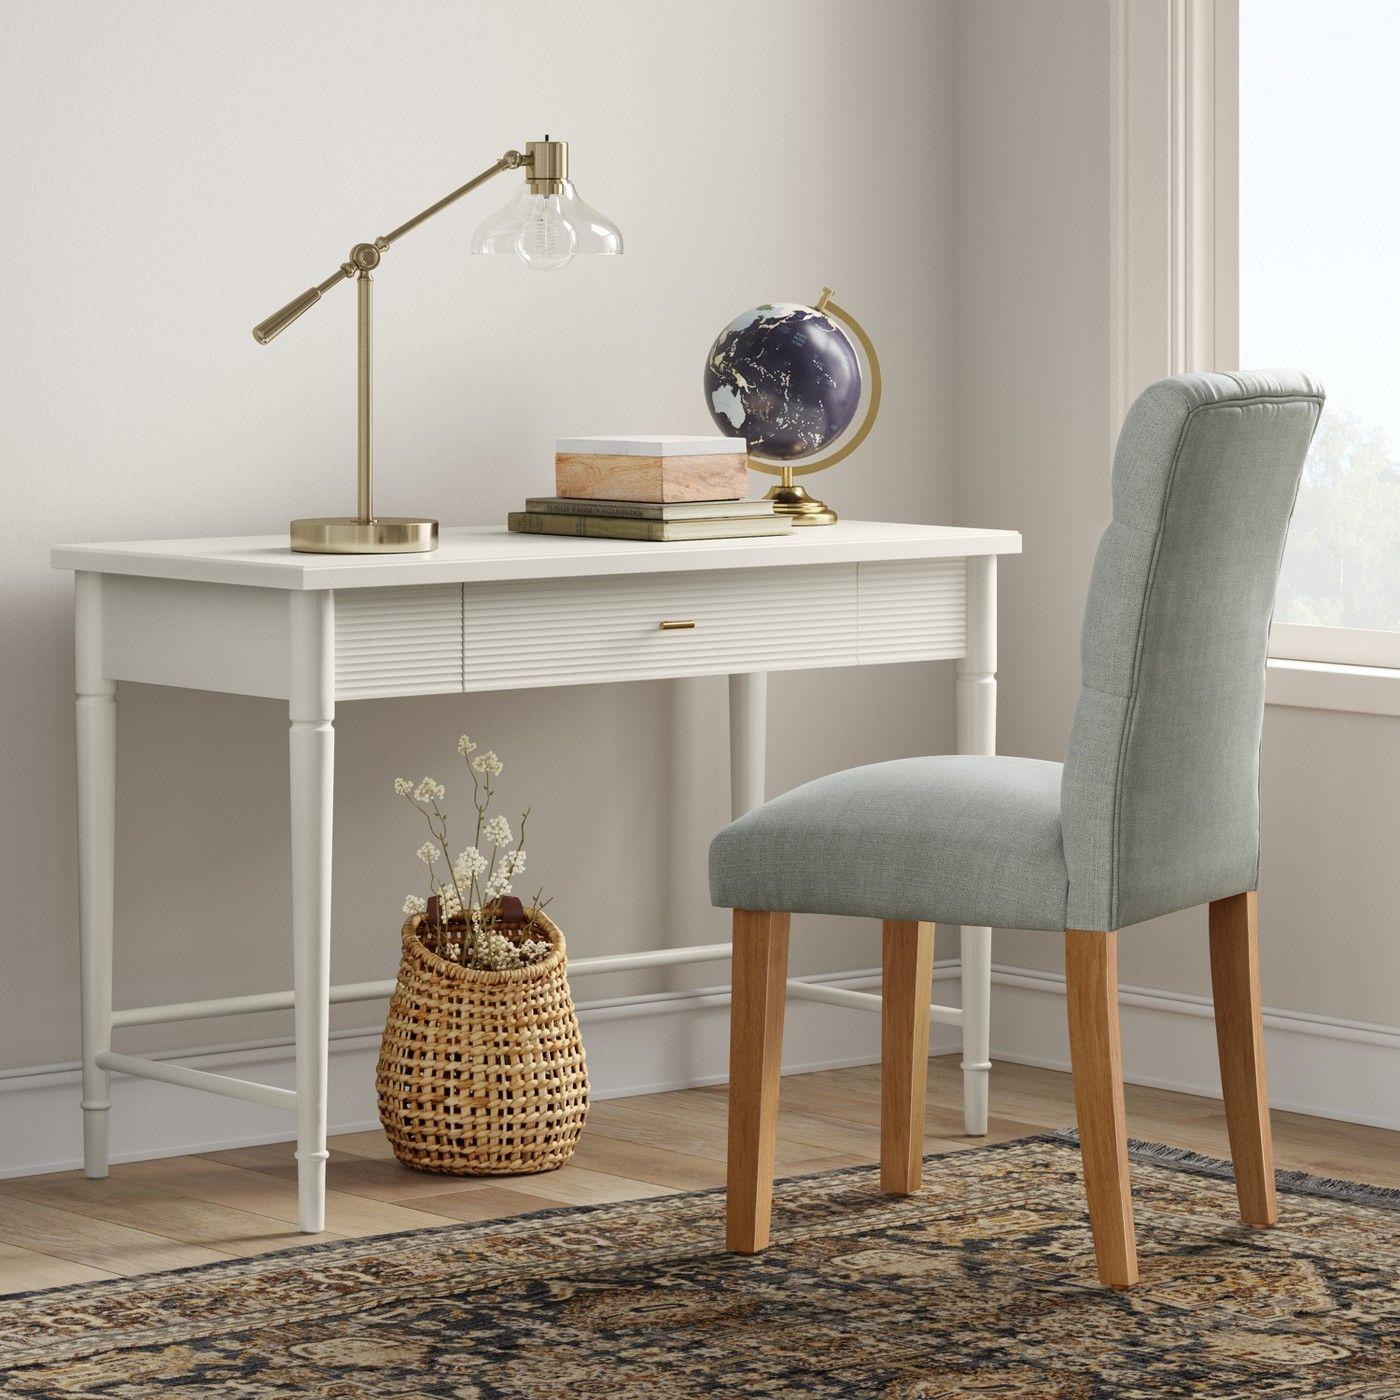 Cambridge Turned Leg Desk Ivory Threshold Image 2 Of 4 Desk With Drawers Writing Desk With Drawers Wood Writing Desk